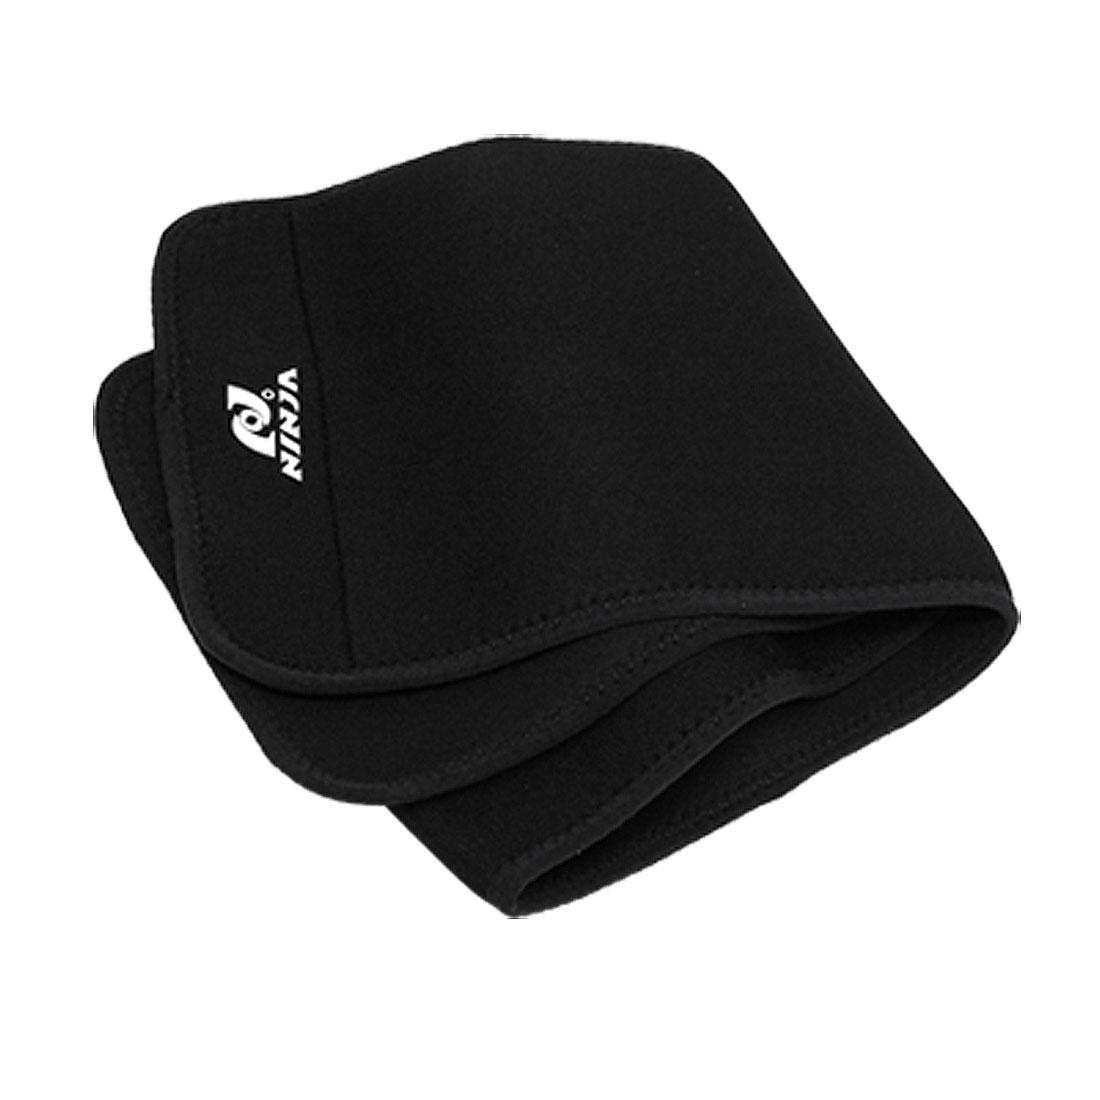 Neoprene Elastic Sport Waist Support Protector Black